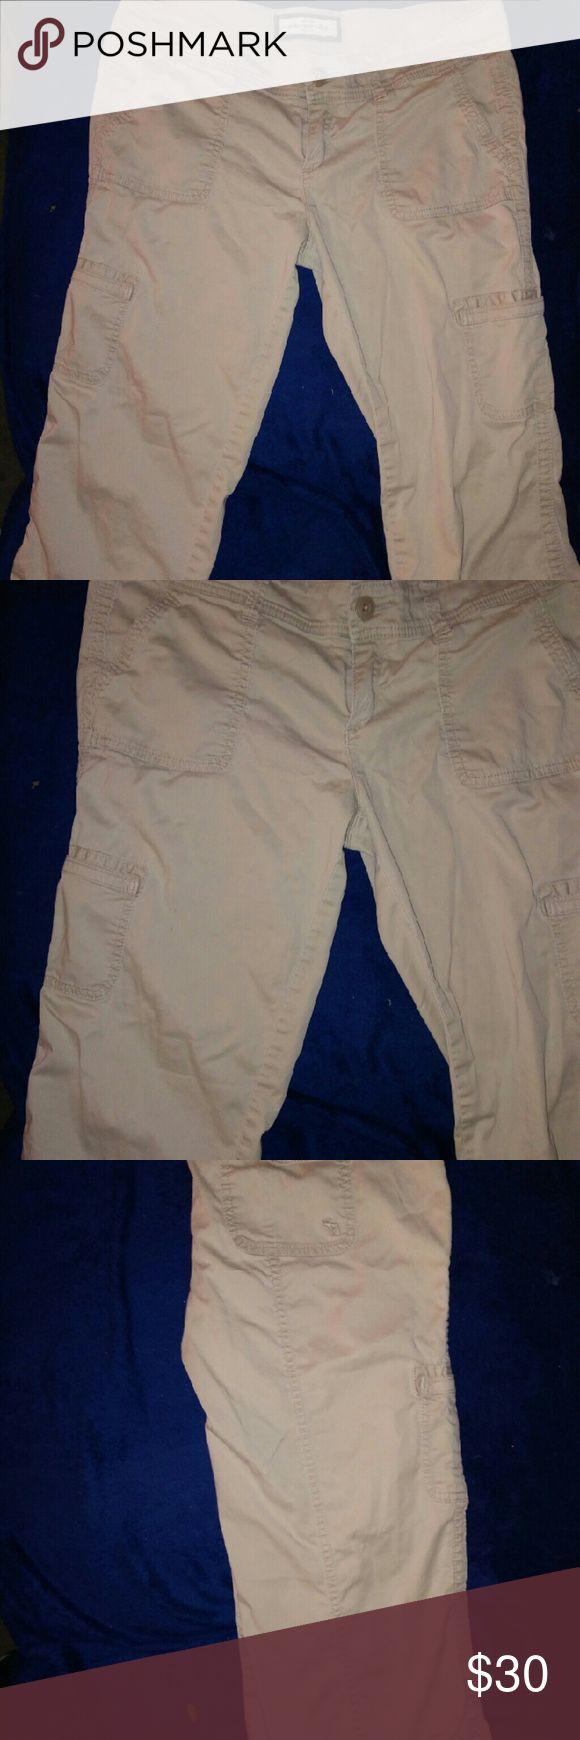 Abercrombie & Fitch khaki capris Abercrombie & Fitch khaki capris cargo style tie waist, cute pockets on sides . Abercrombie & Fitch Pants